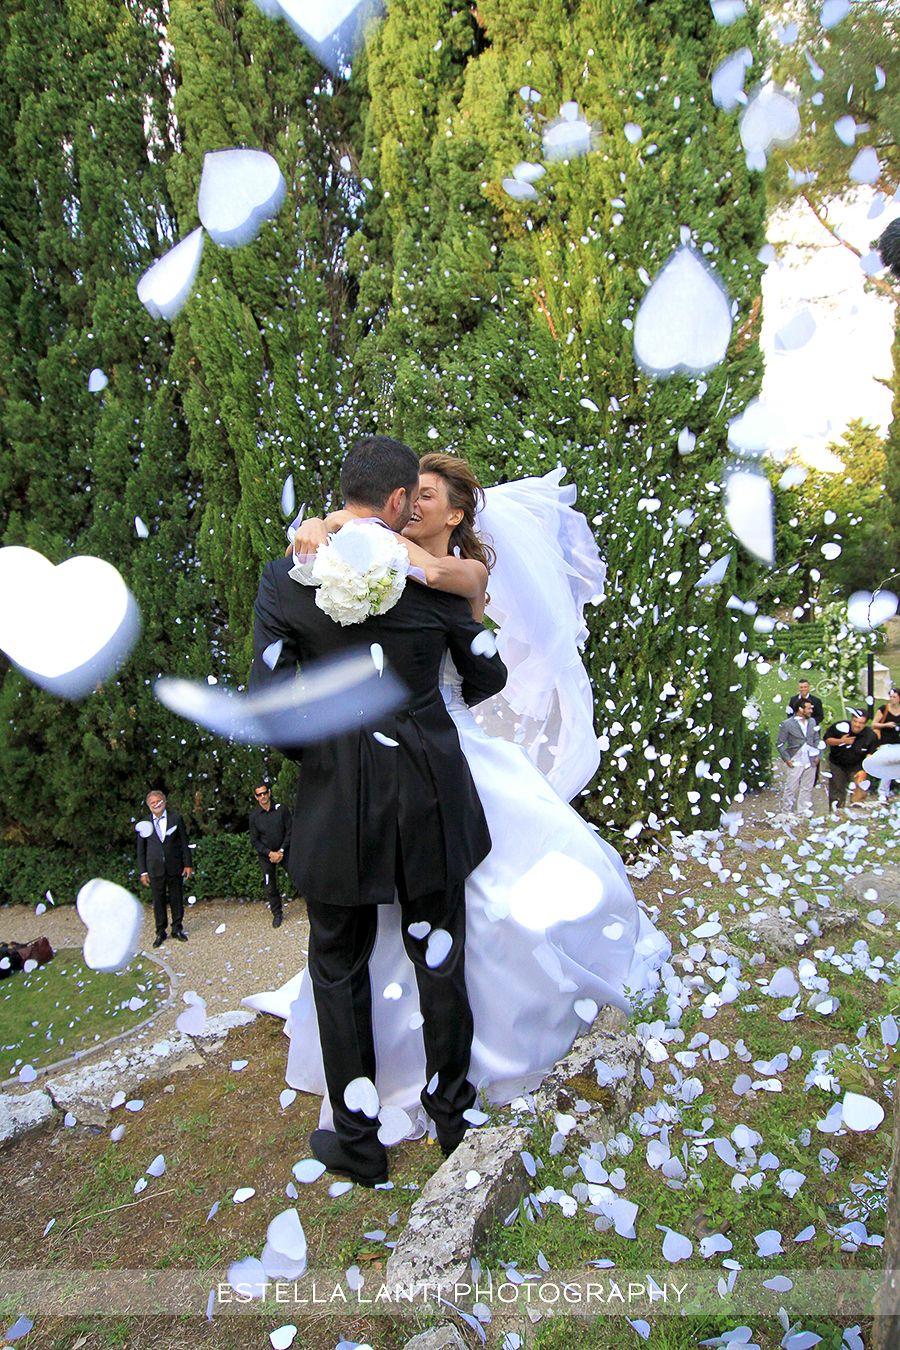 Matrimonio Nel Bosco Toscana : Juventus bonucci calciatori modelle vip matrimonio vip nozze